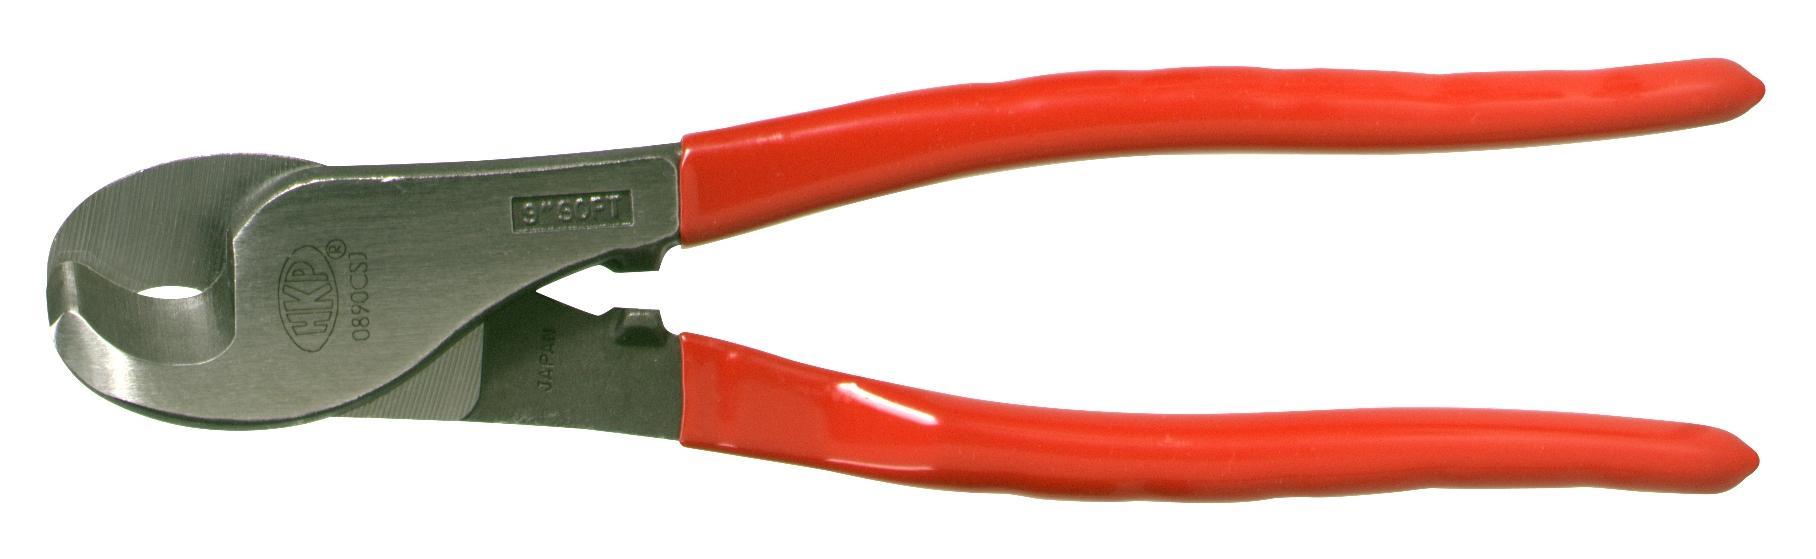 Kềm cắt cáp 10 Black Hand BH-450